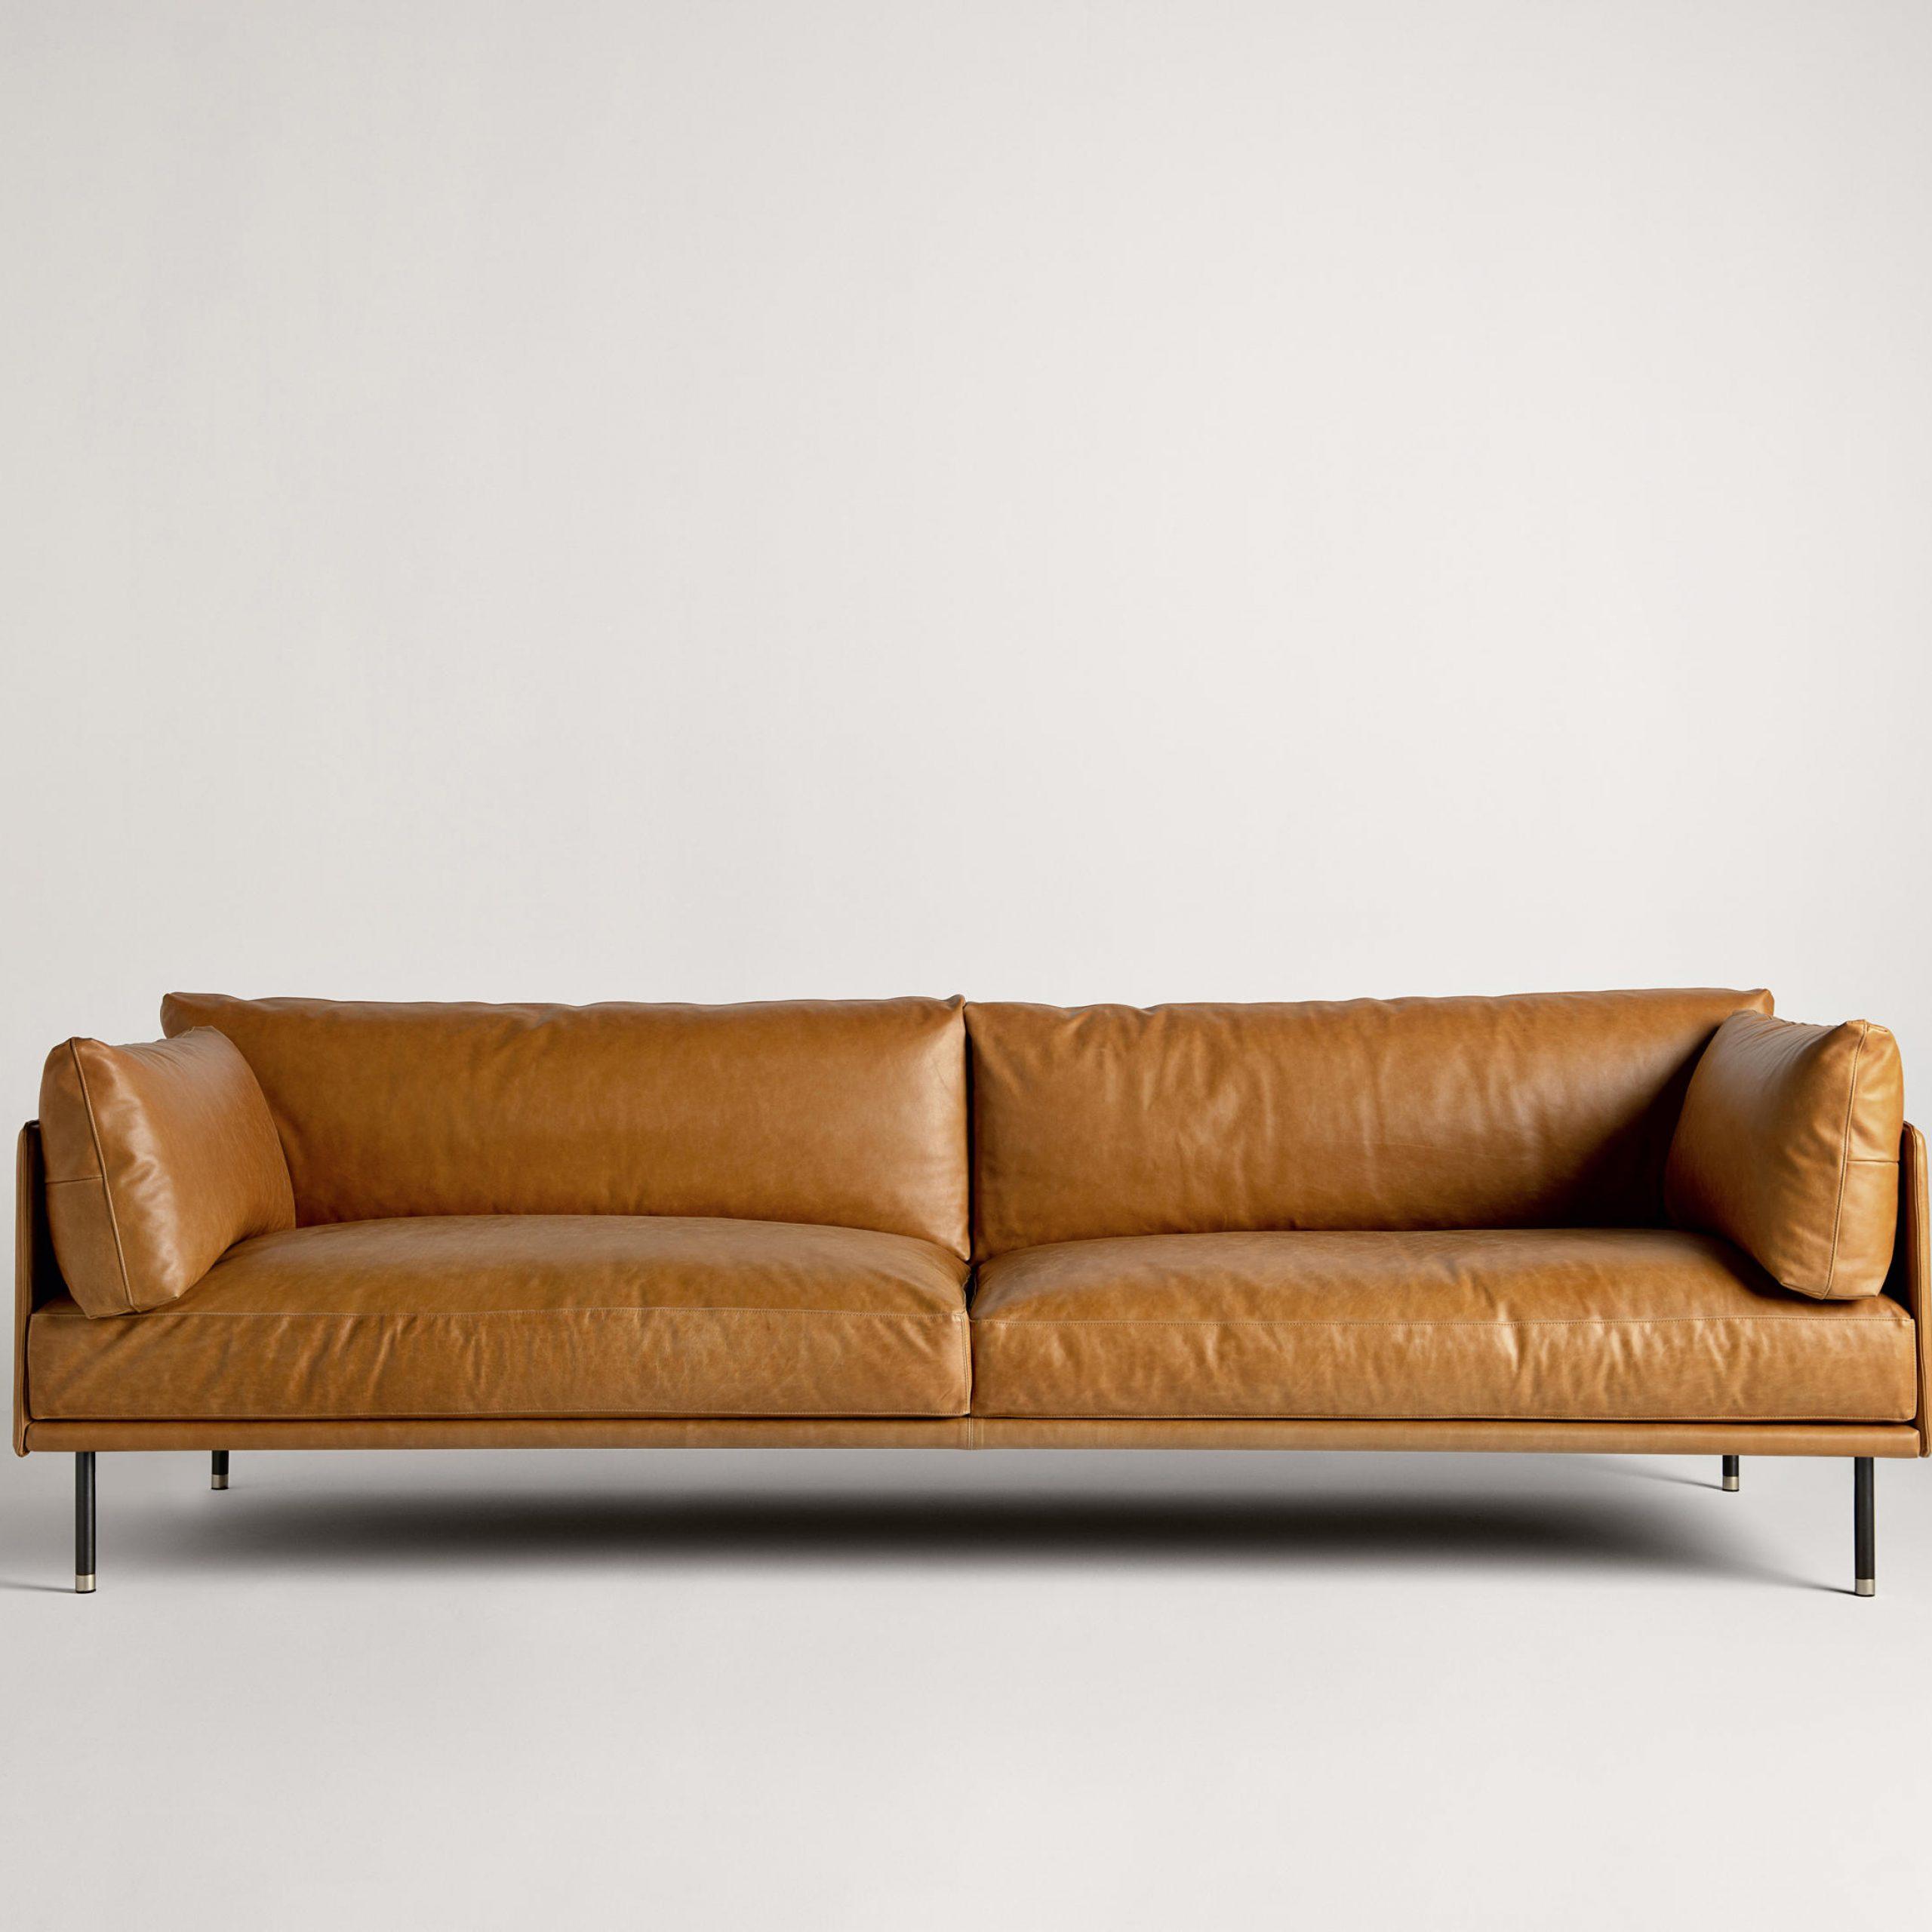 Wilton   Sofa – Sofas From Frag   Architonic Pertaining To Wilton Fabric Sectional Sofas (View 10 of 15)